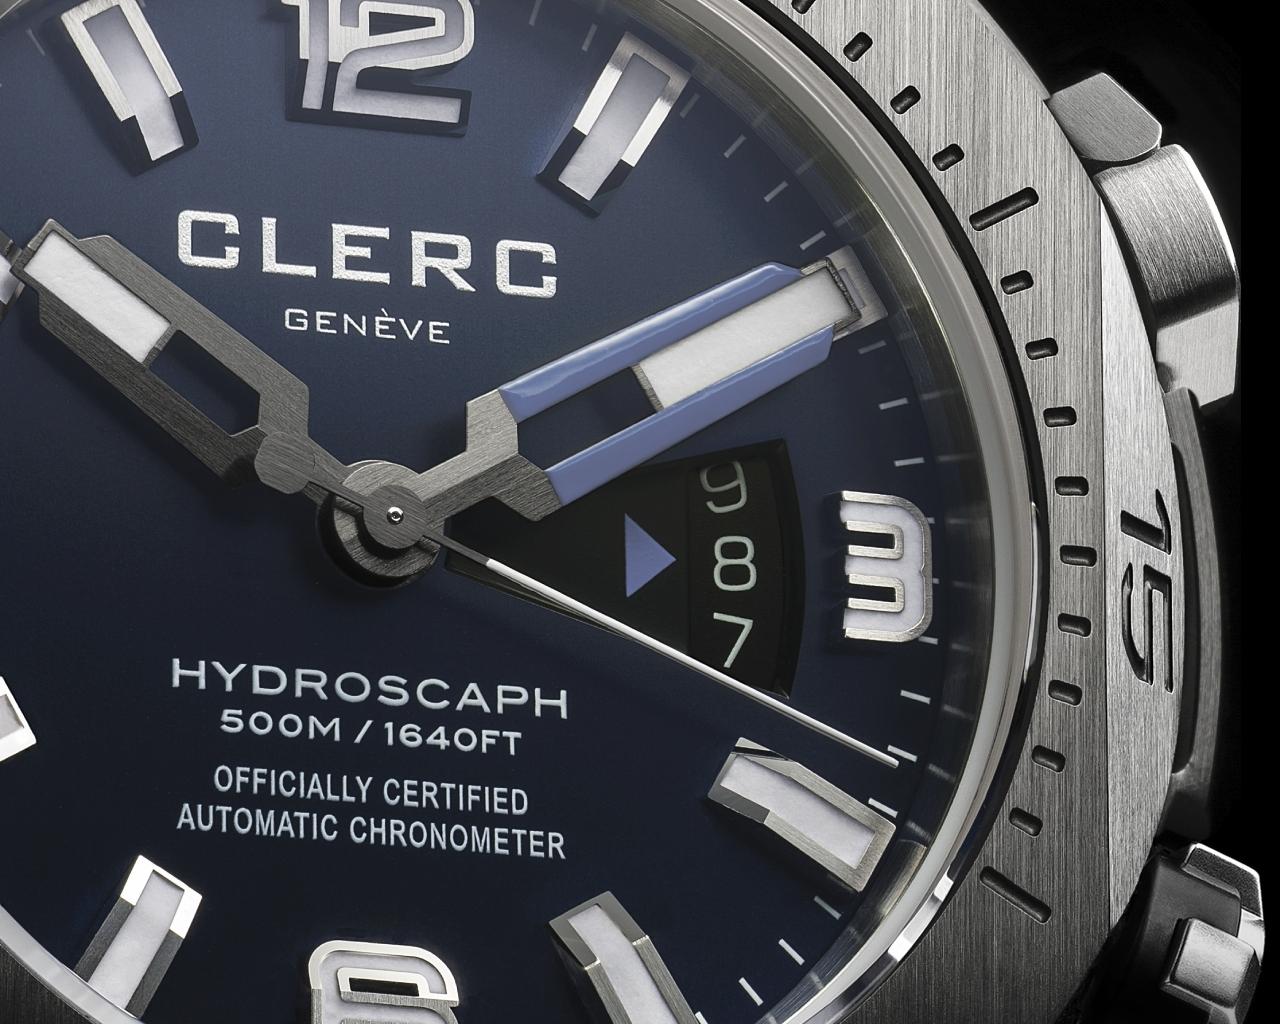 Clerc Hydrosdfgfgcaph H1 Chronometer ref.H1-1.B.3